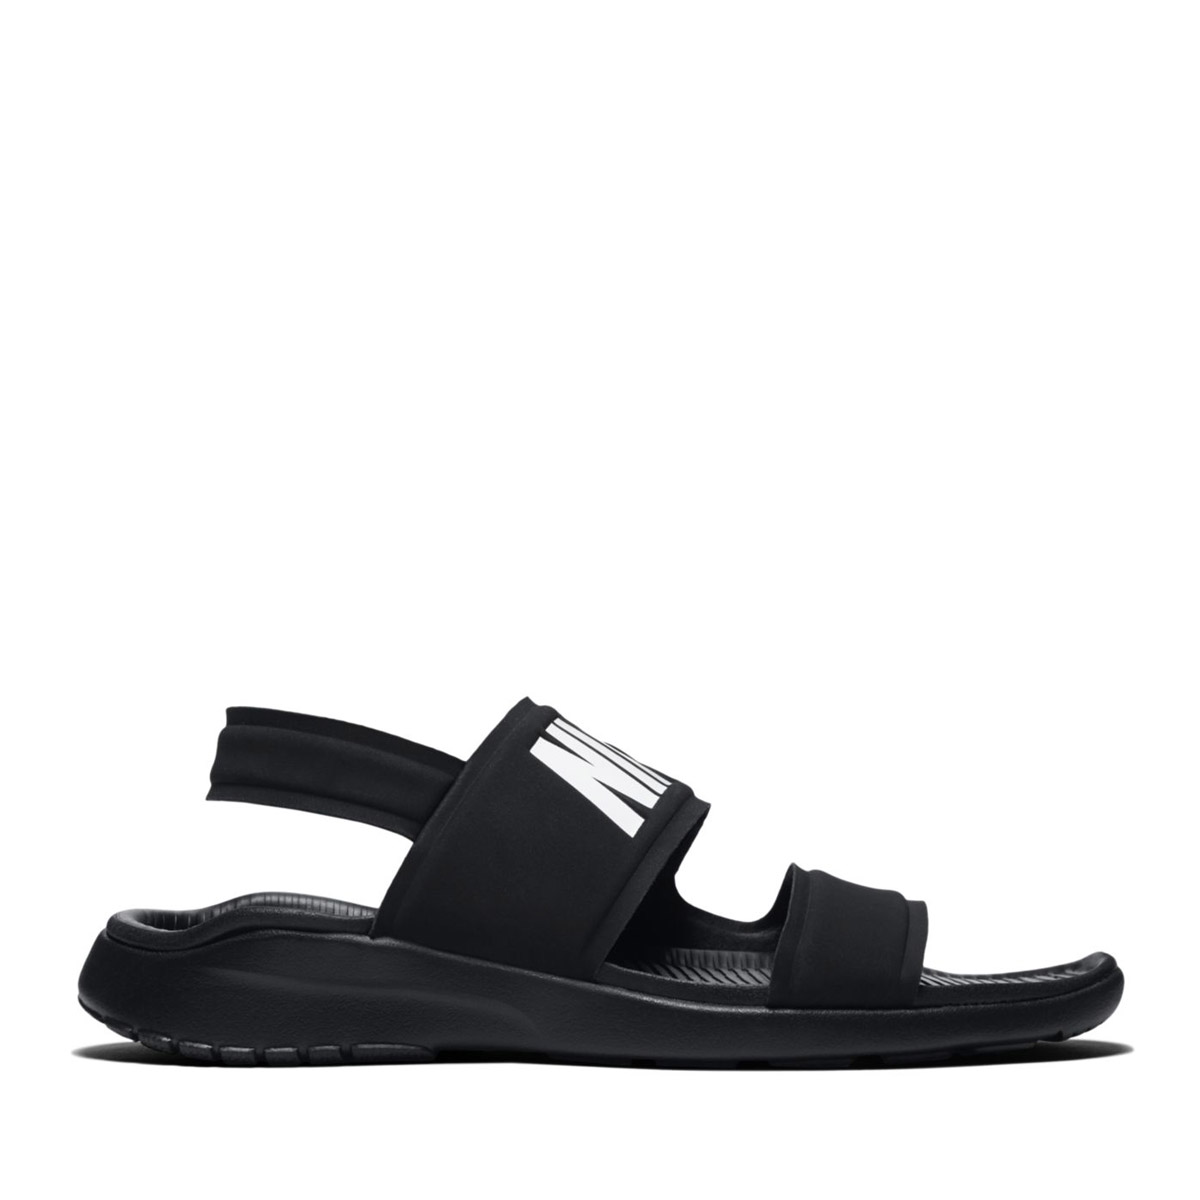 abf75a0739ed NIKE WMNS TANJUN SANDAL (BLACK WHITE-BLACK) (Nike women tongue Jun sandals)